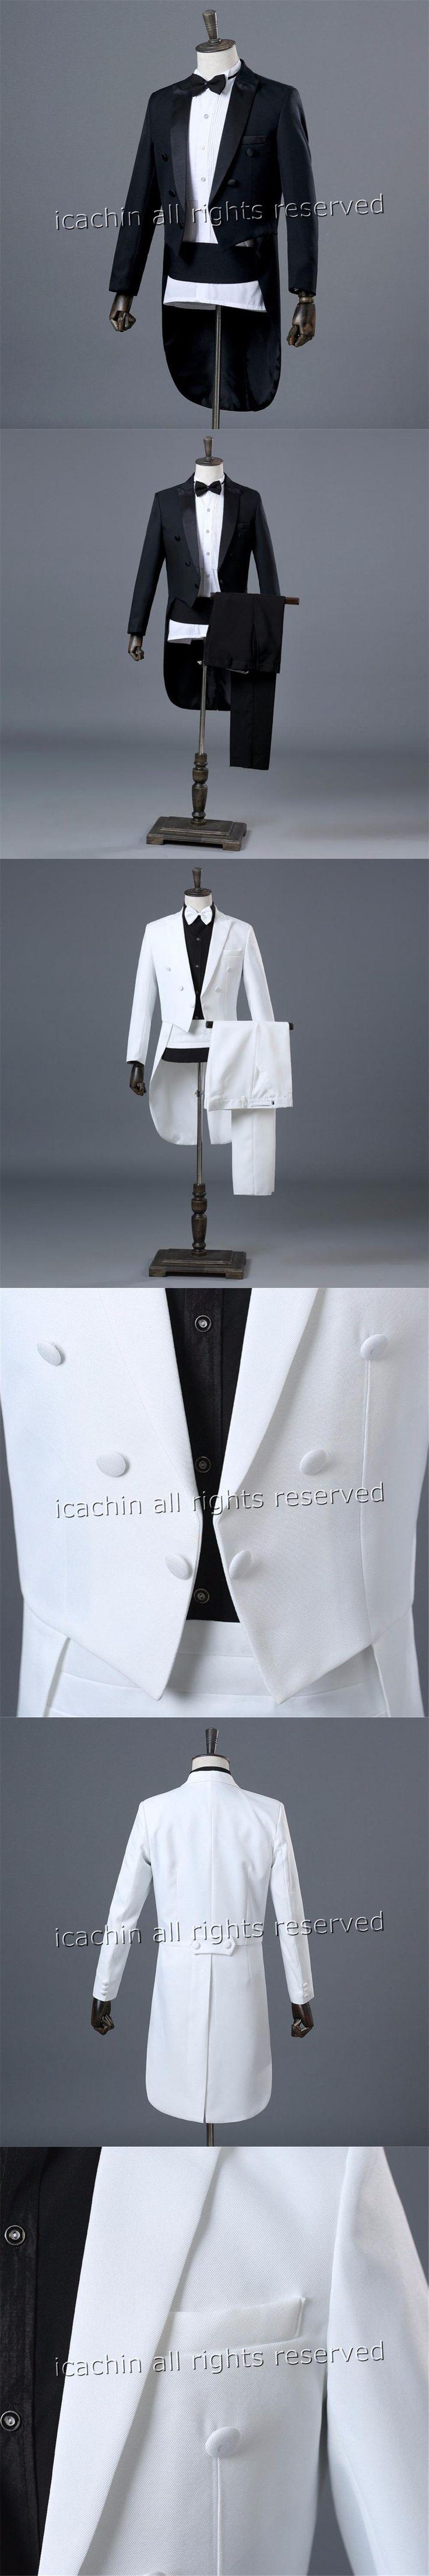 Basic Style Mens Tuxedo Black Tailcoat Mens Terno Masculino White Suit Men Costume Homme Christmas Suits